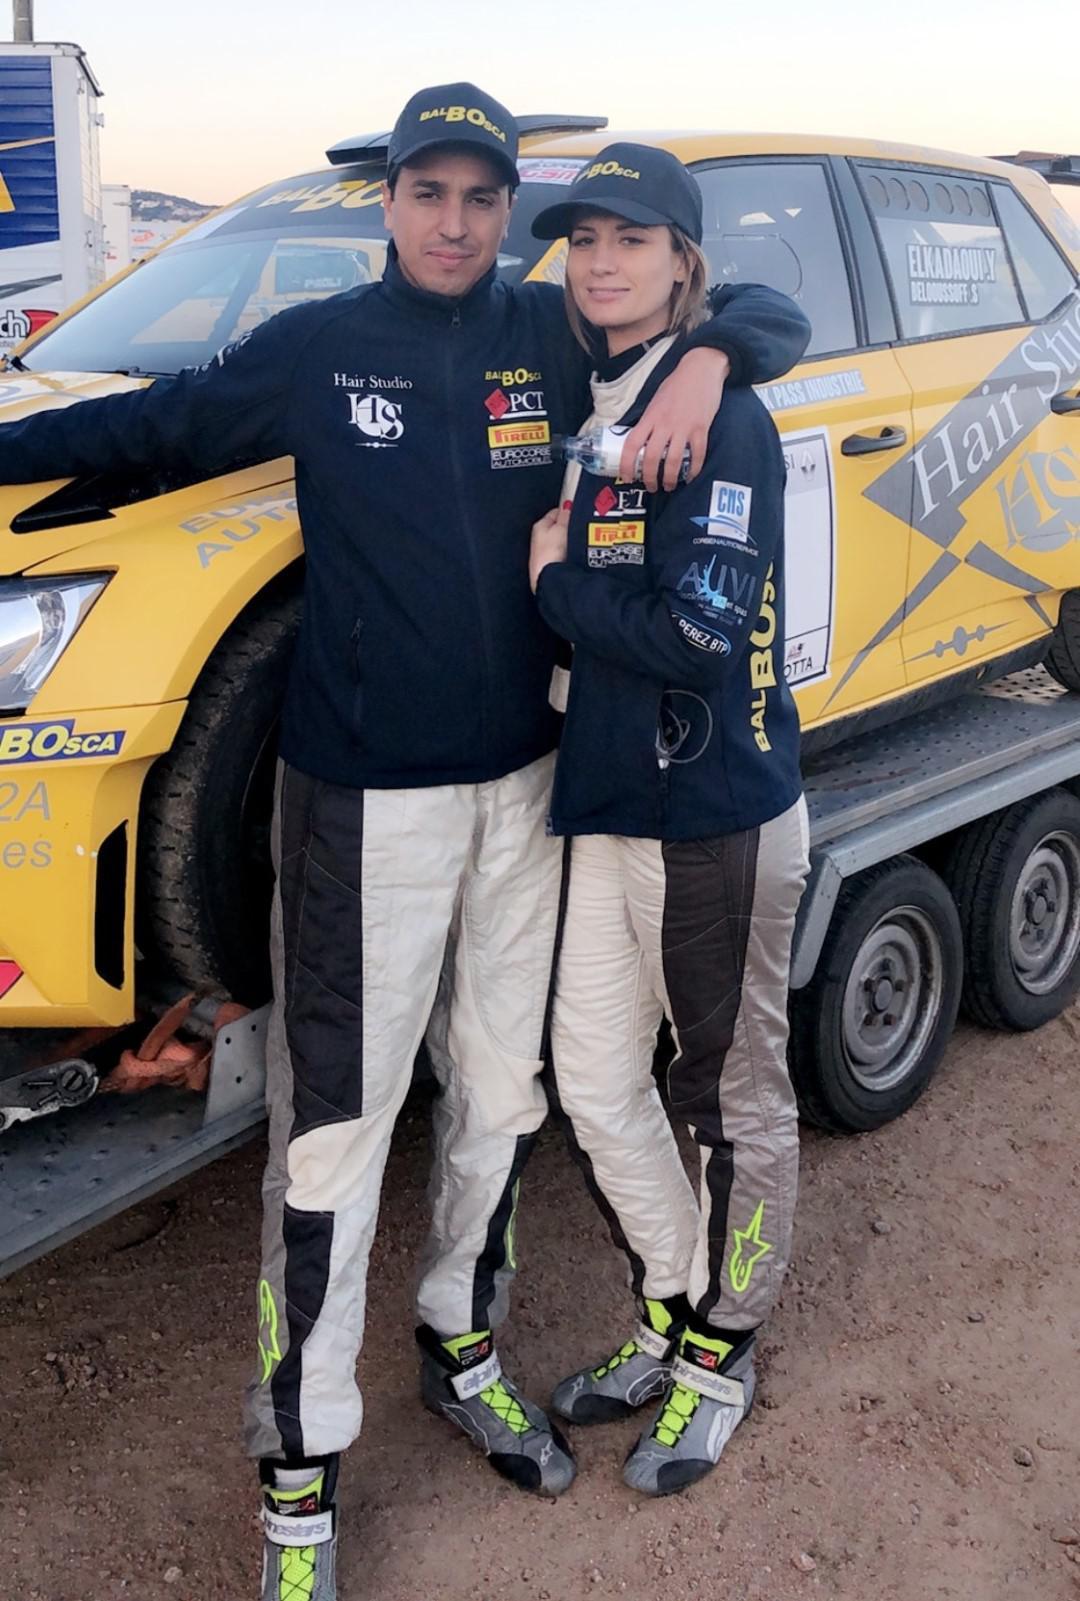 un-talentueux-pilote-marocain-decouvert-grace-au-maroc-historic-rally-1081-1.jpg